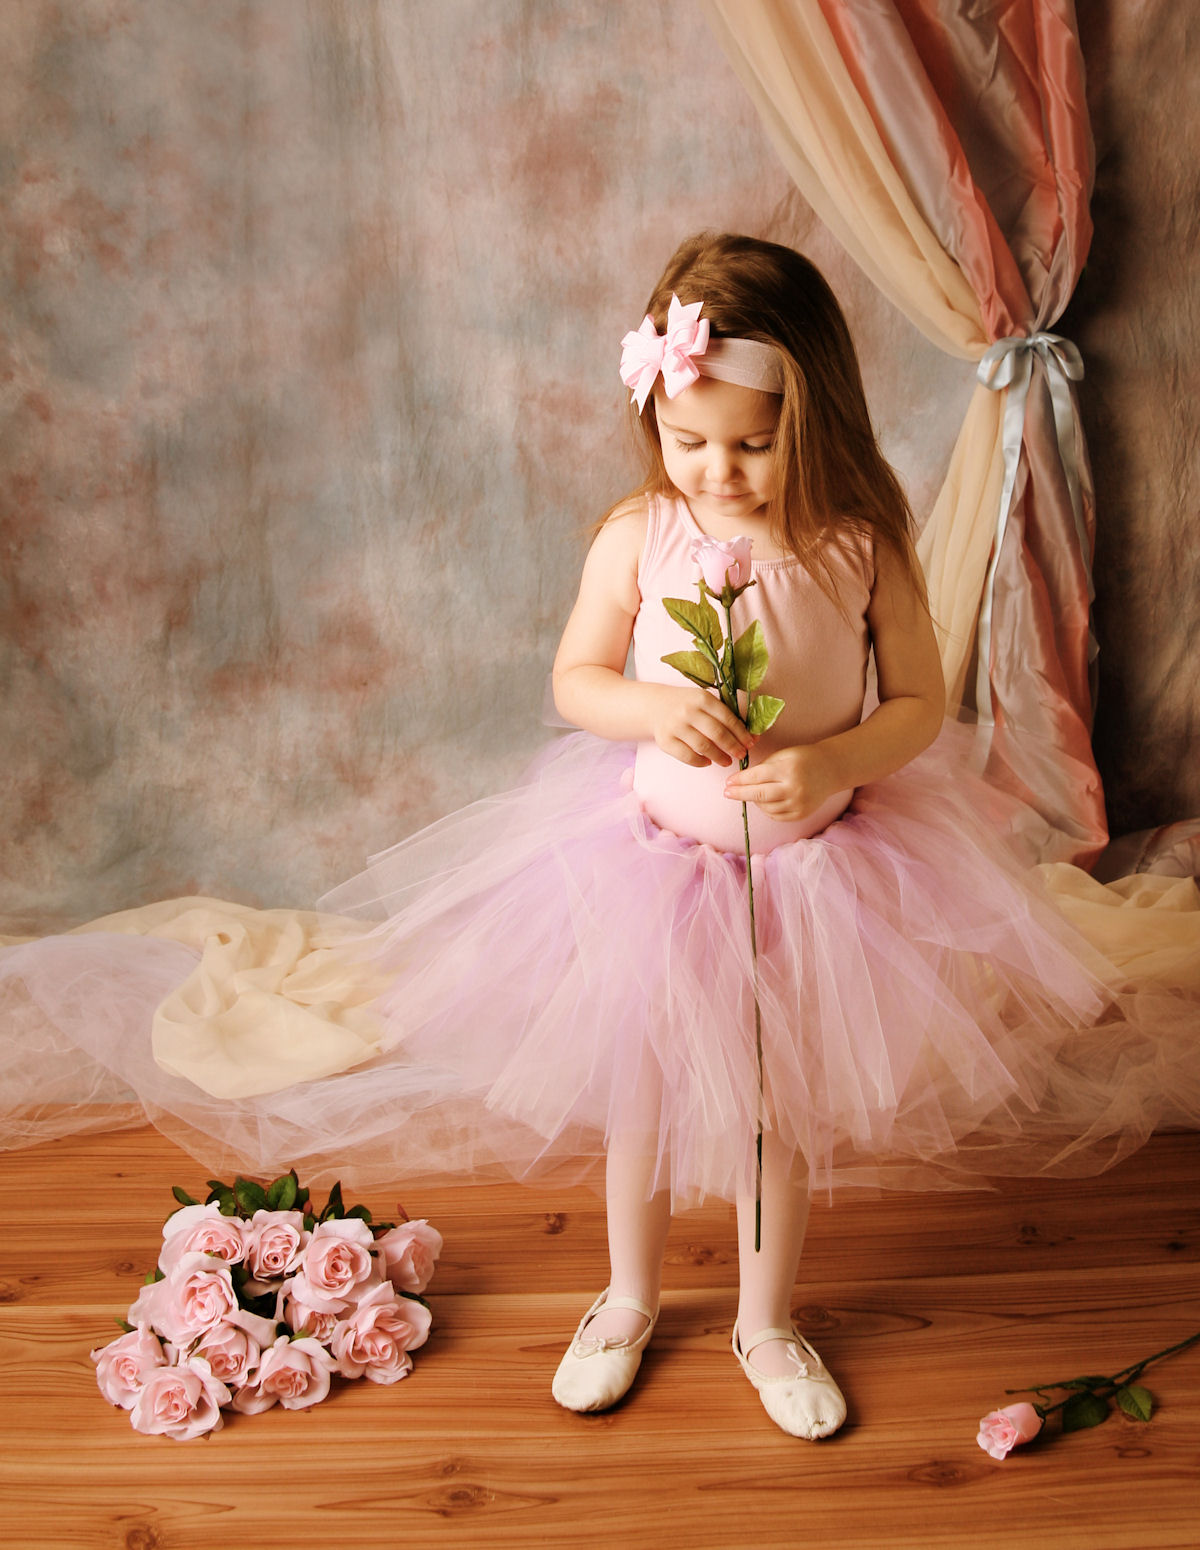 http://4.bp.blogspot.com/-Kbel9j6KxFk/UI30a9ptaBI/AAAAAAABNN8/e4Ni-b4jBZE/s1600/peque%25C3%25B1a-bailarina-con-una-rosa-color-rosa-en-sus-manos-little-ballerina-with-a-pink-rose.jpg